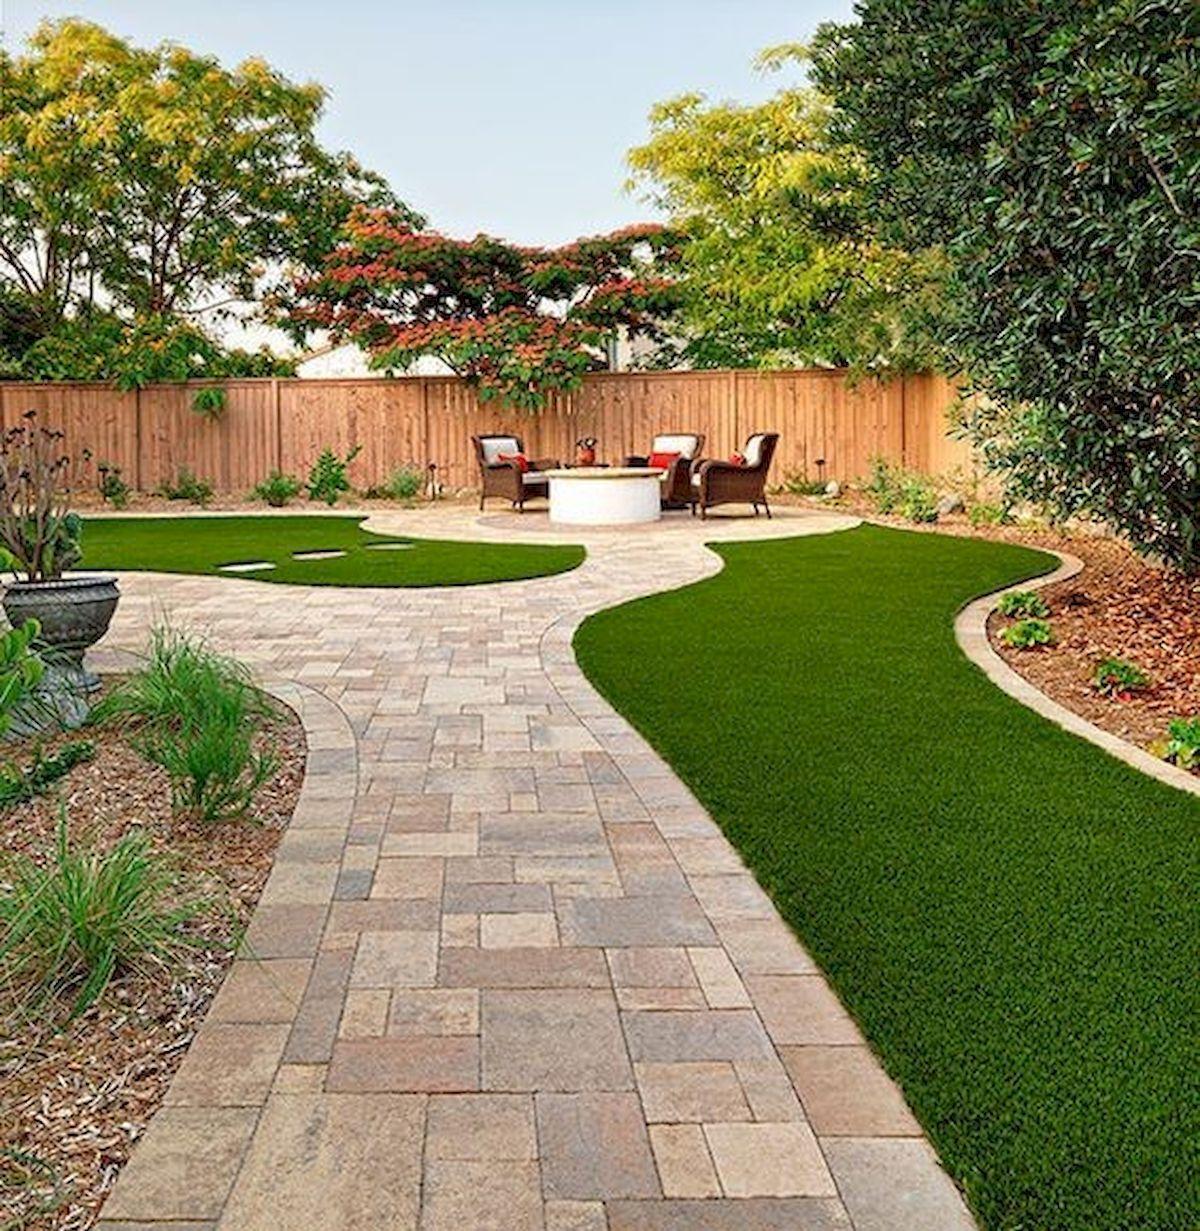 Beautiful Backyards Garden Ideas: 33 Beautiful Backyard Garden Design Ideas